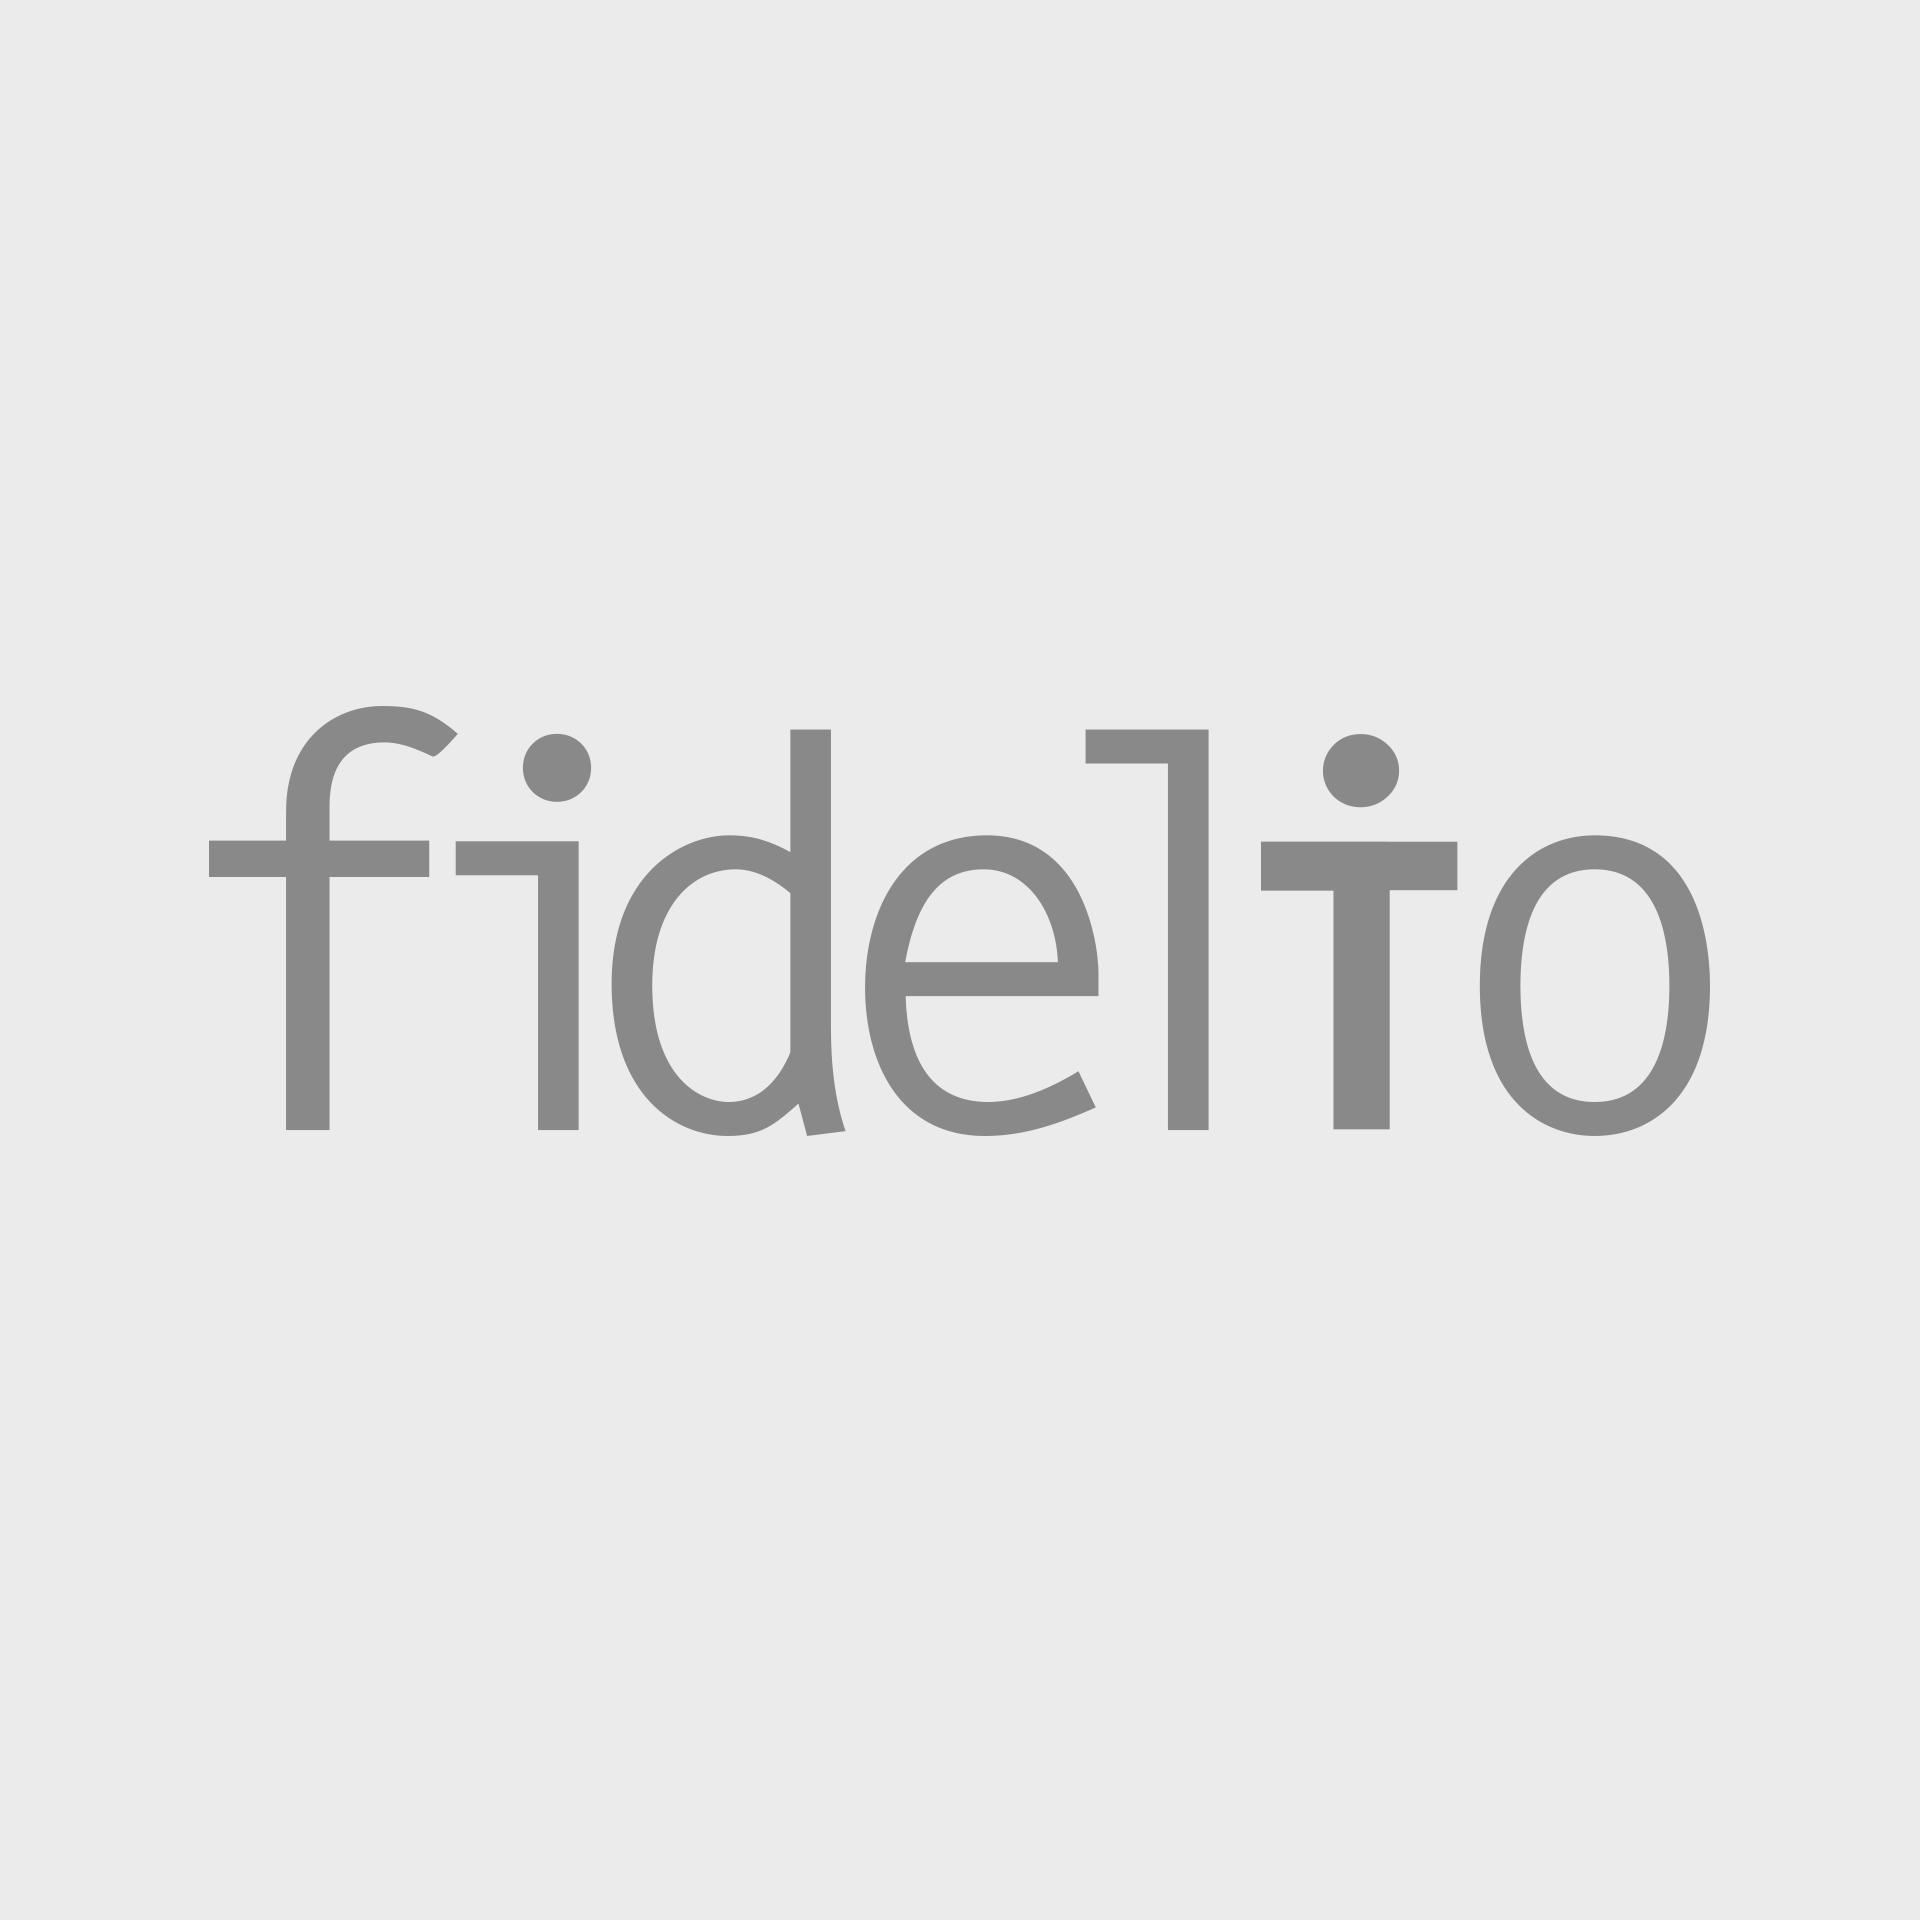 Idofutar_-104305.jpg